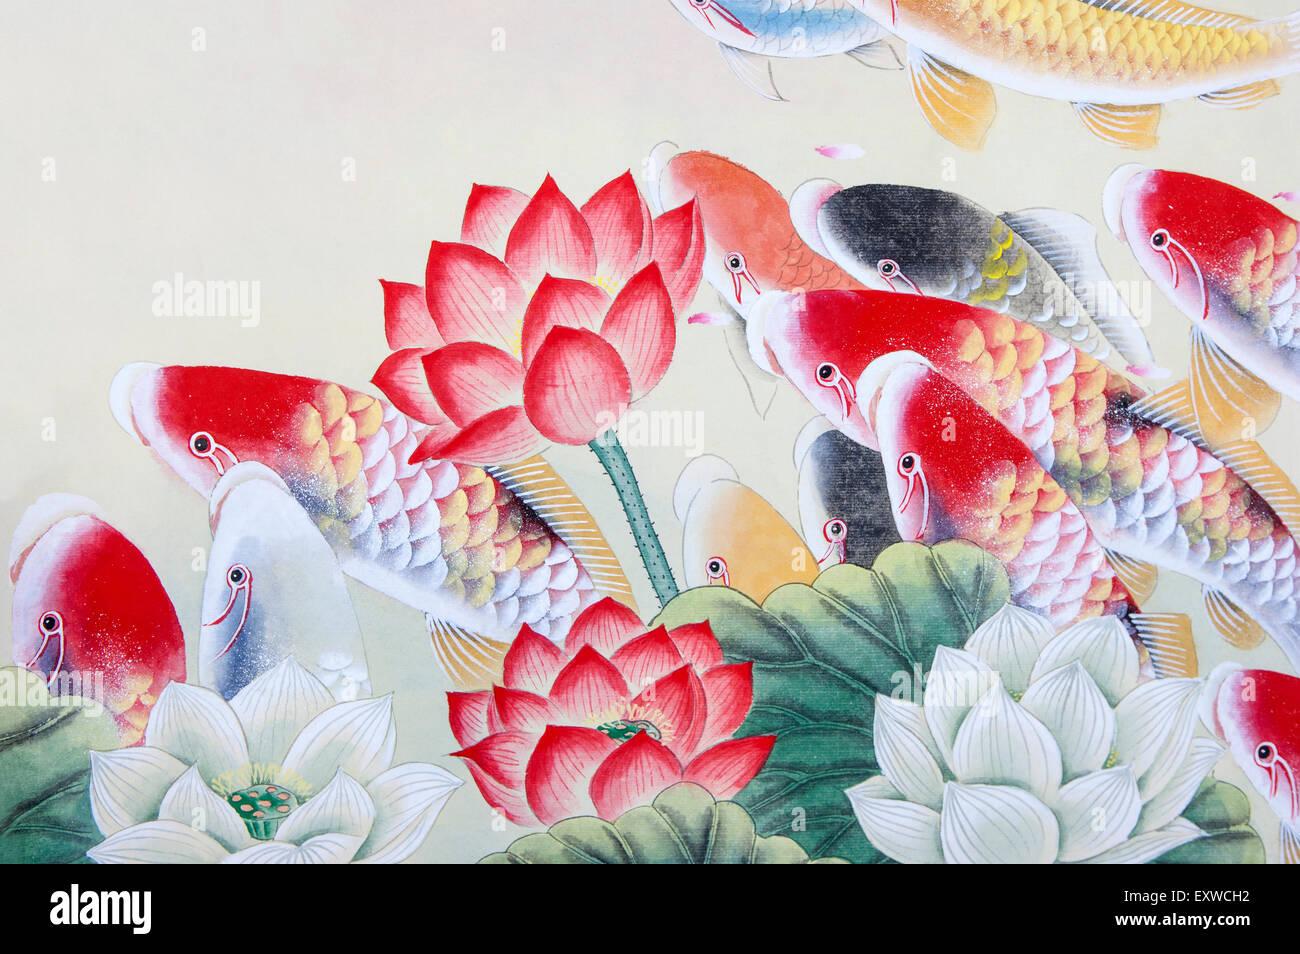 Traditional chinese painting koi carp lotus stock photo 85381214 traditional chinese painting koi carp lotus izmirmasajfo